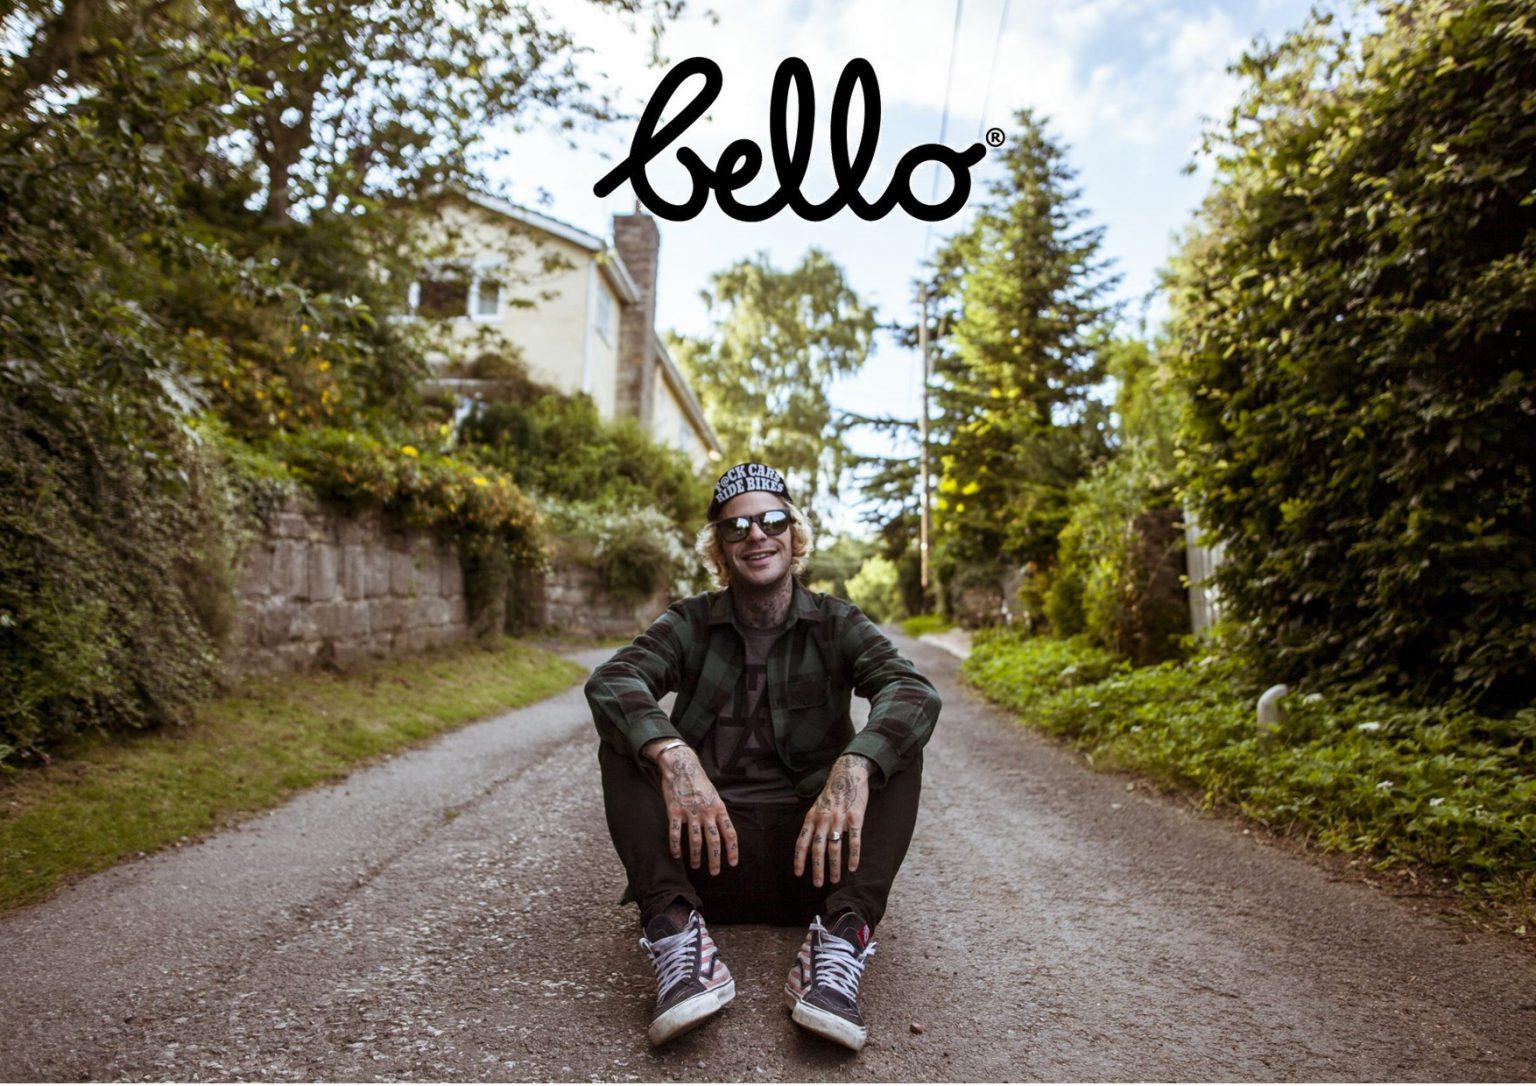 BELLO CYCLIST